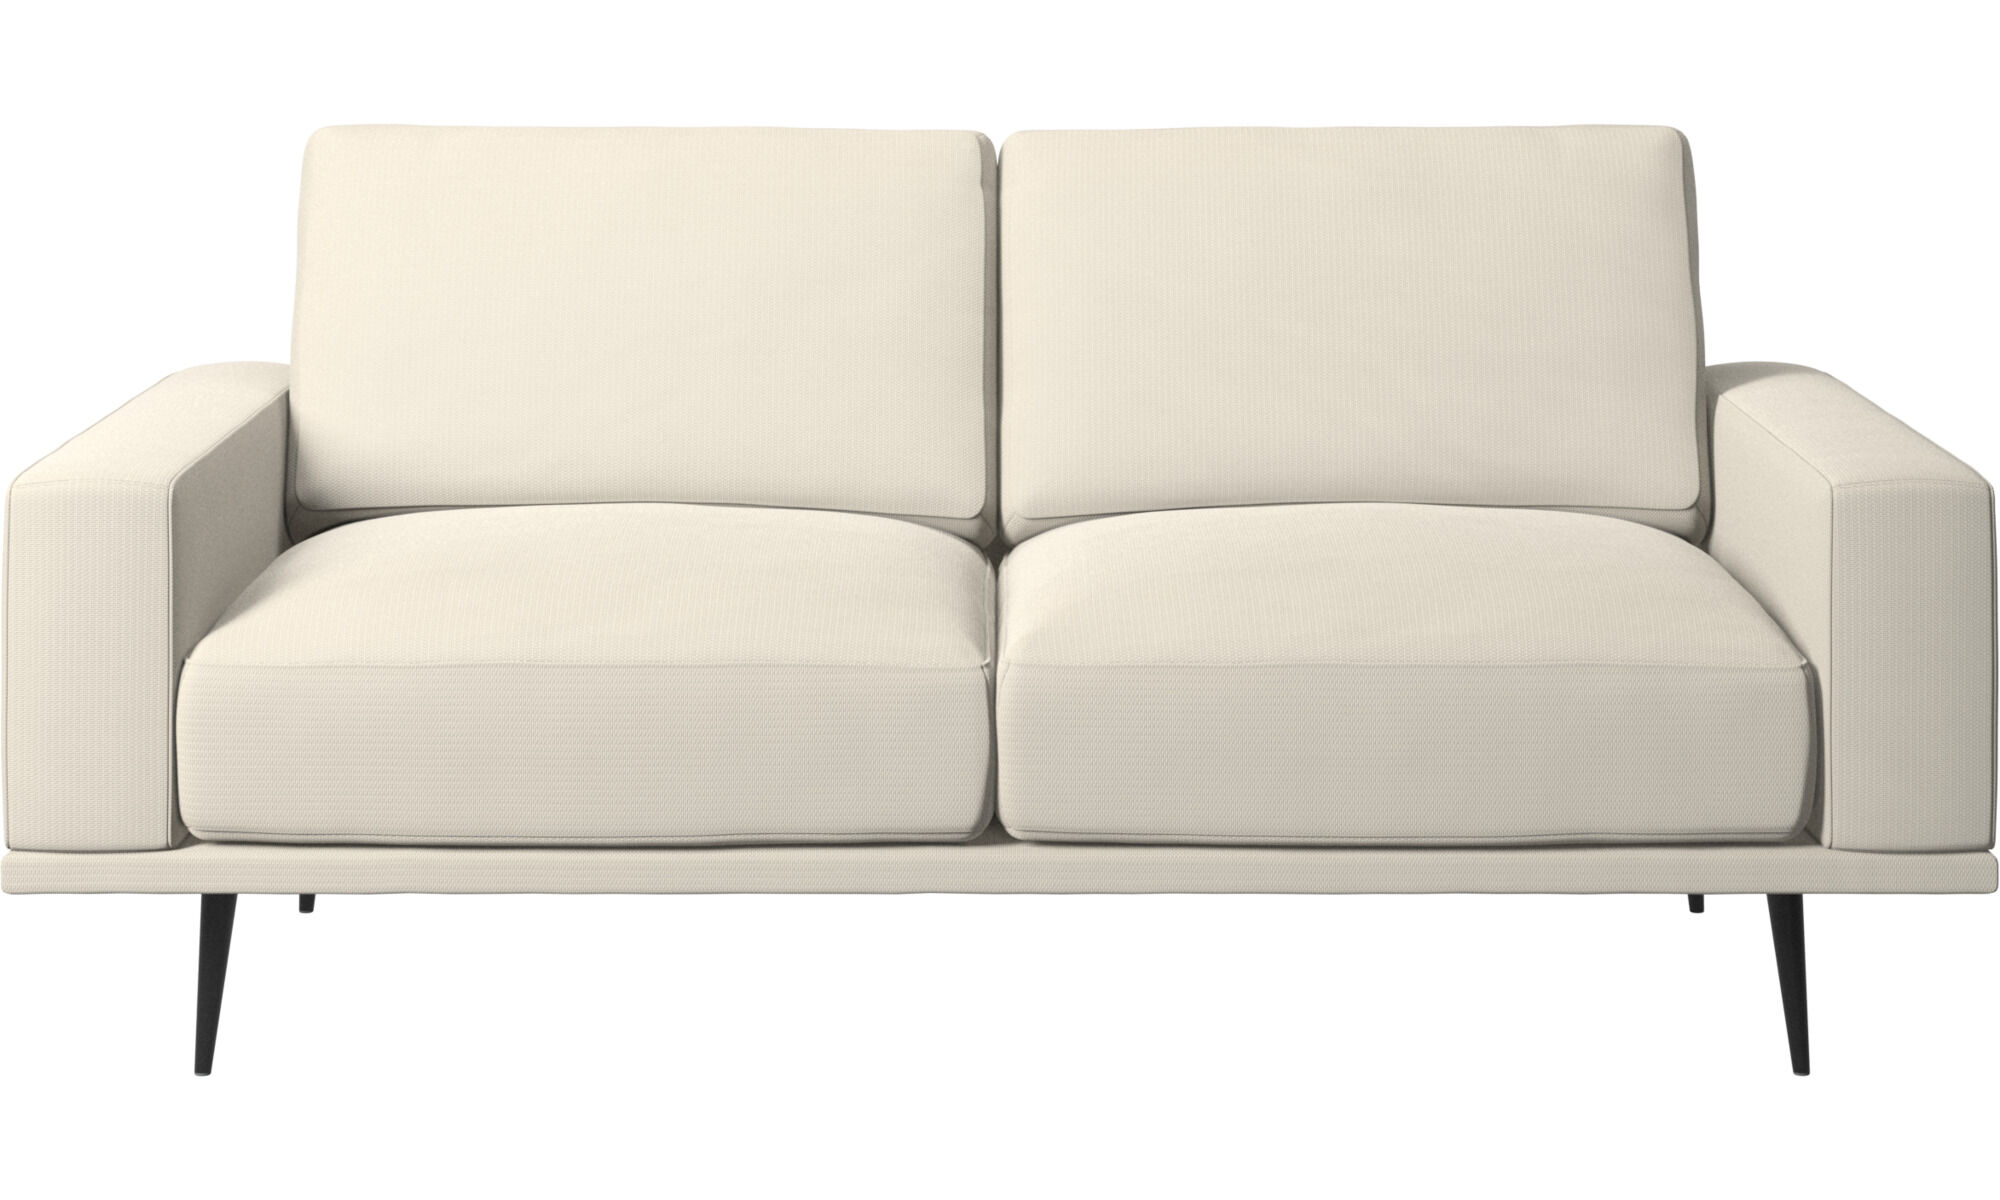 New Designs   Carlton Sofa   White   Fabric